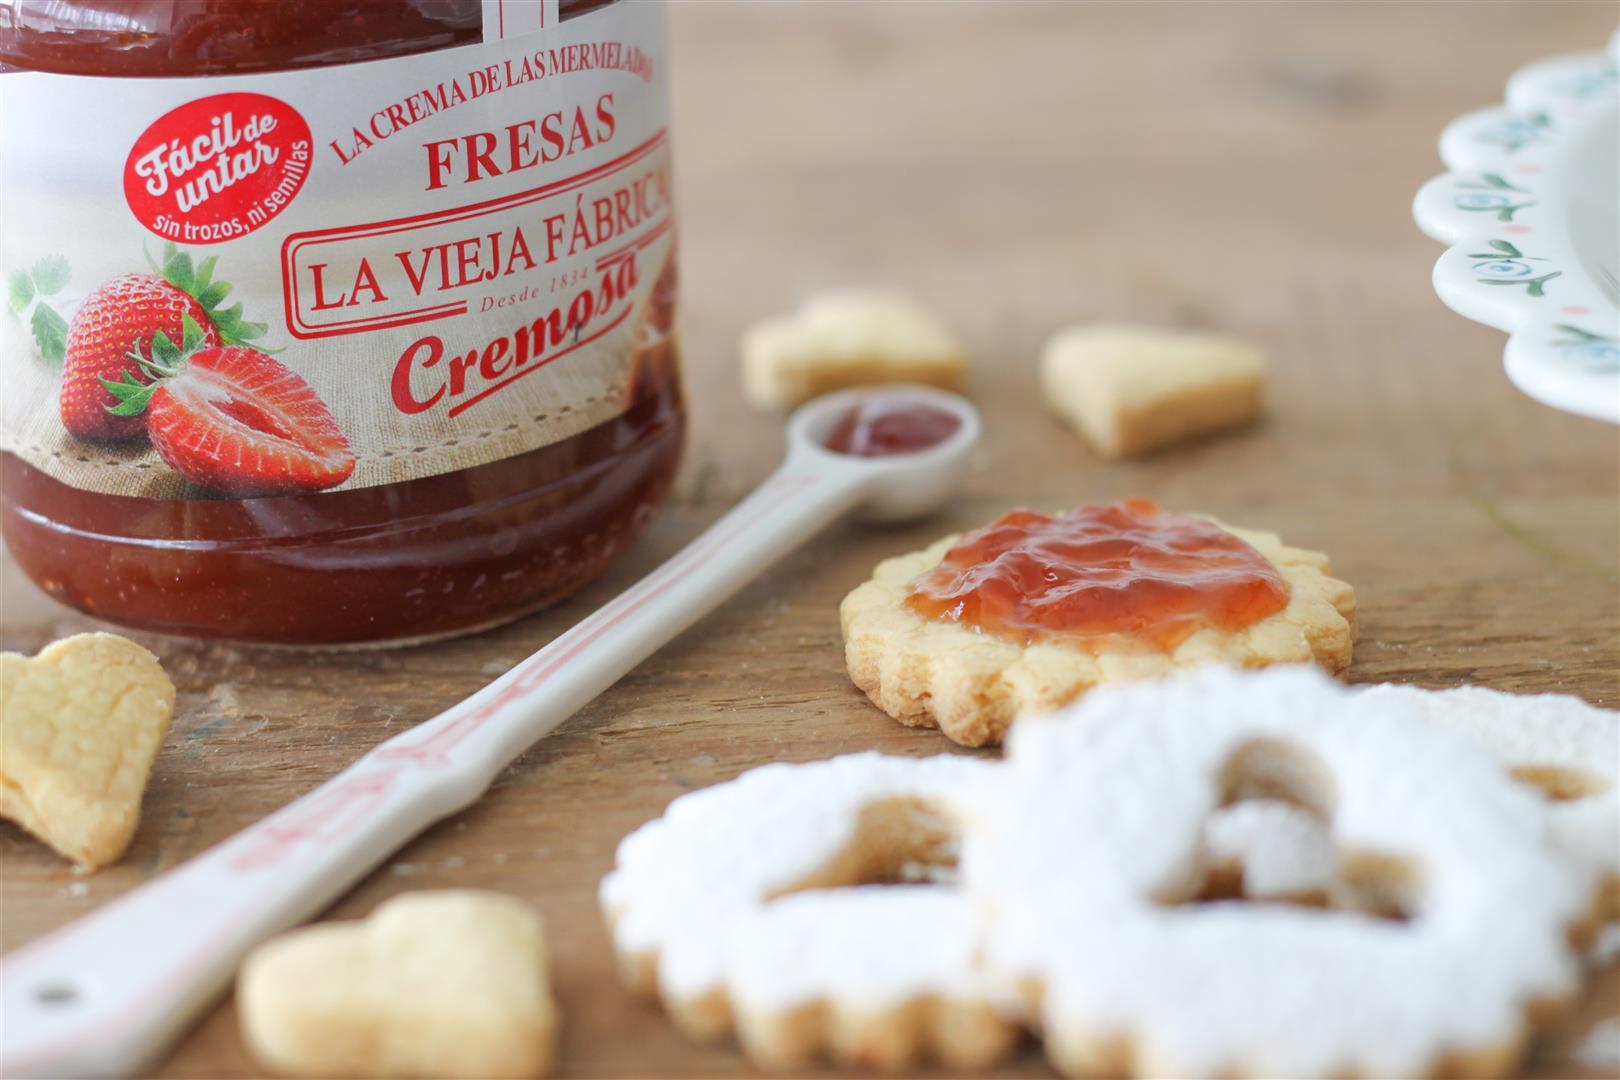 la-vieja-fabrica-mermelada-cremosa-(1)